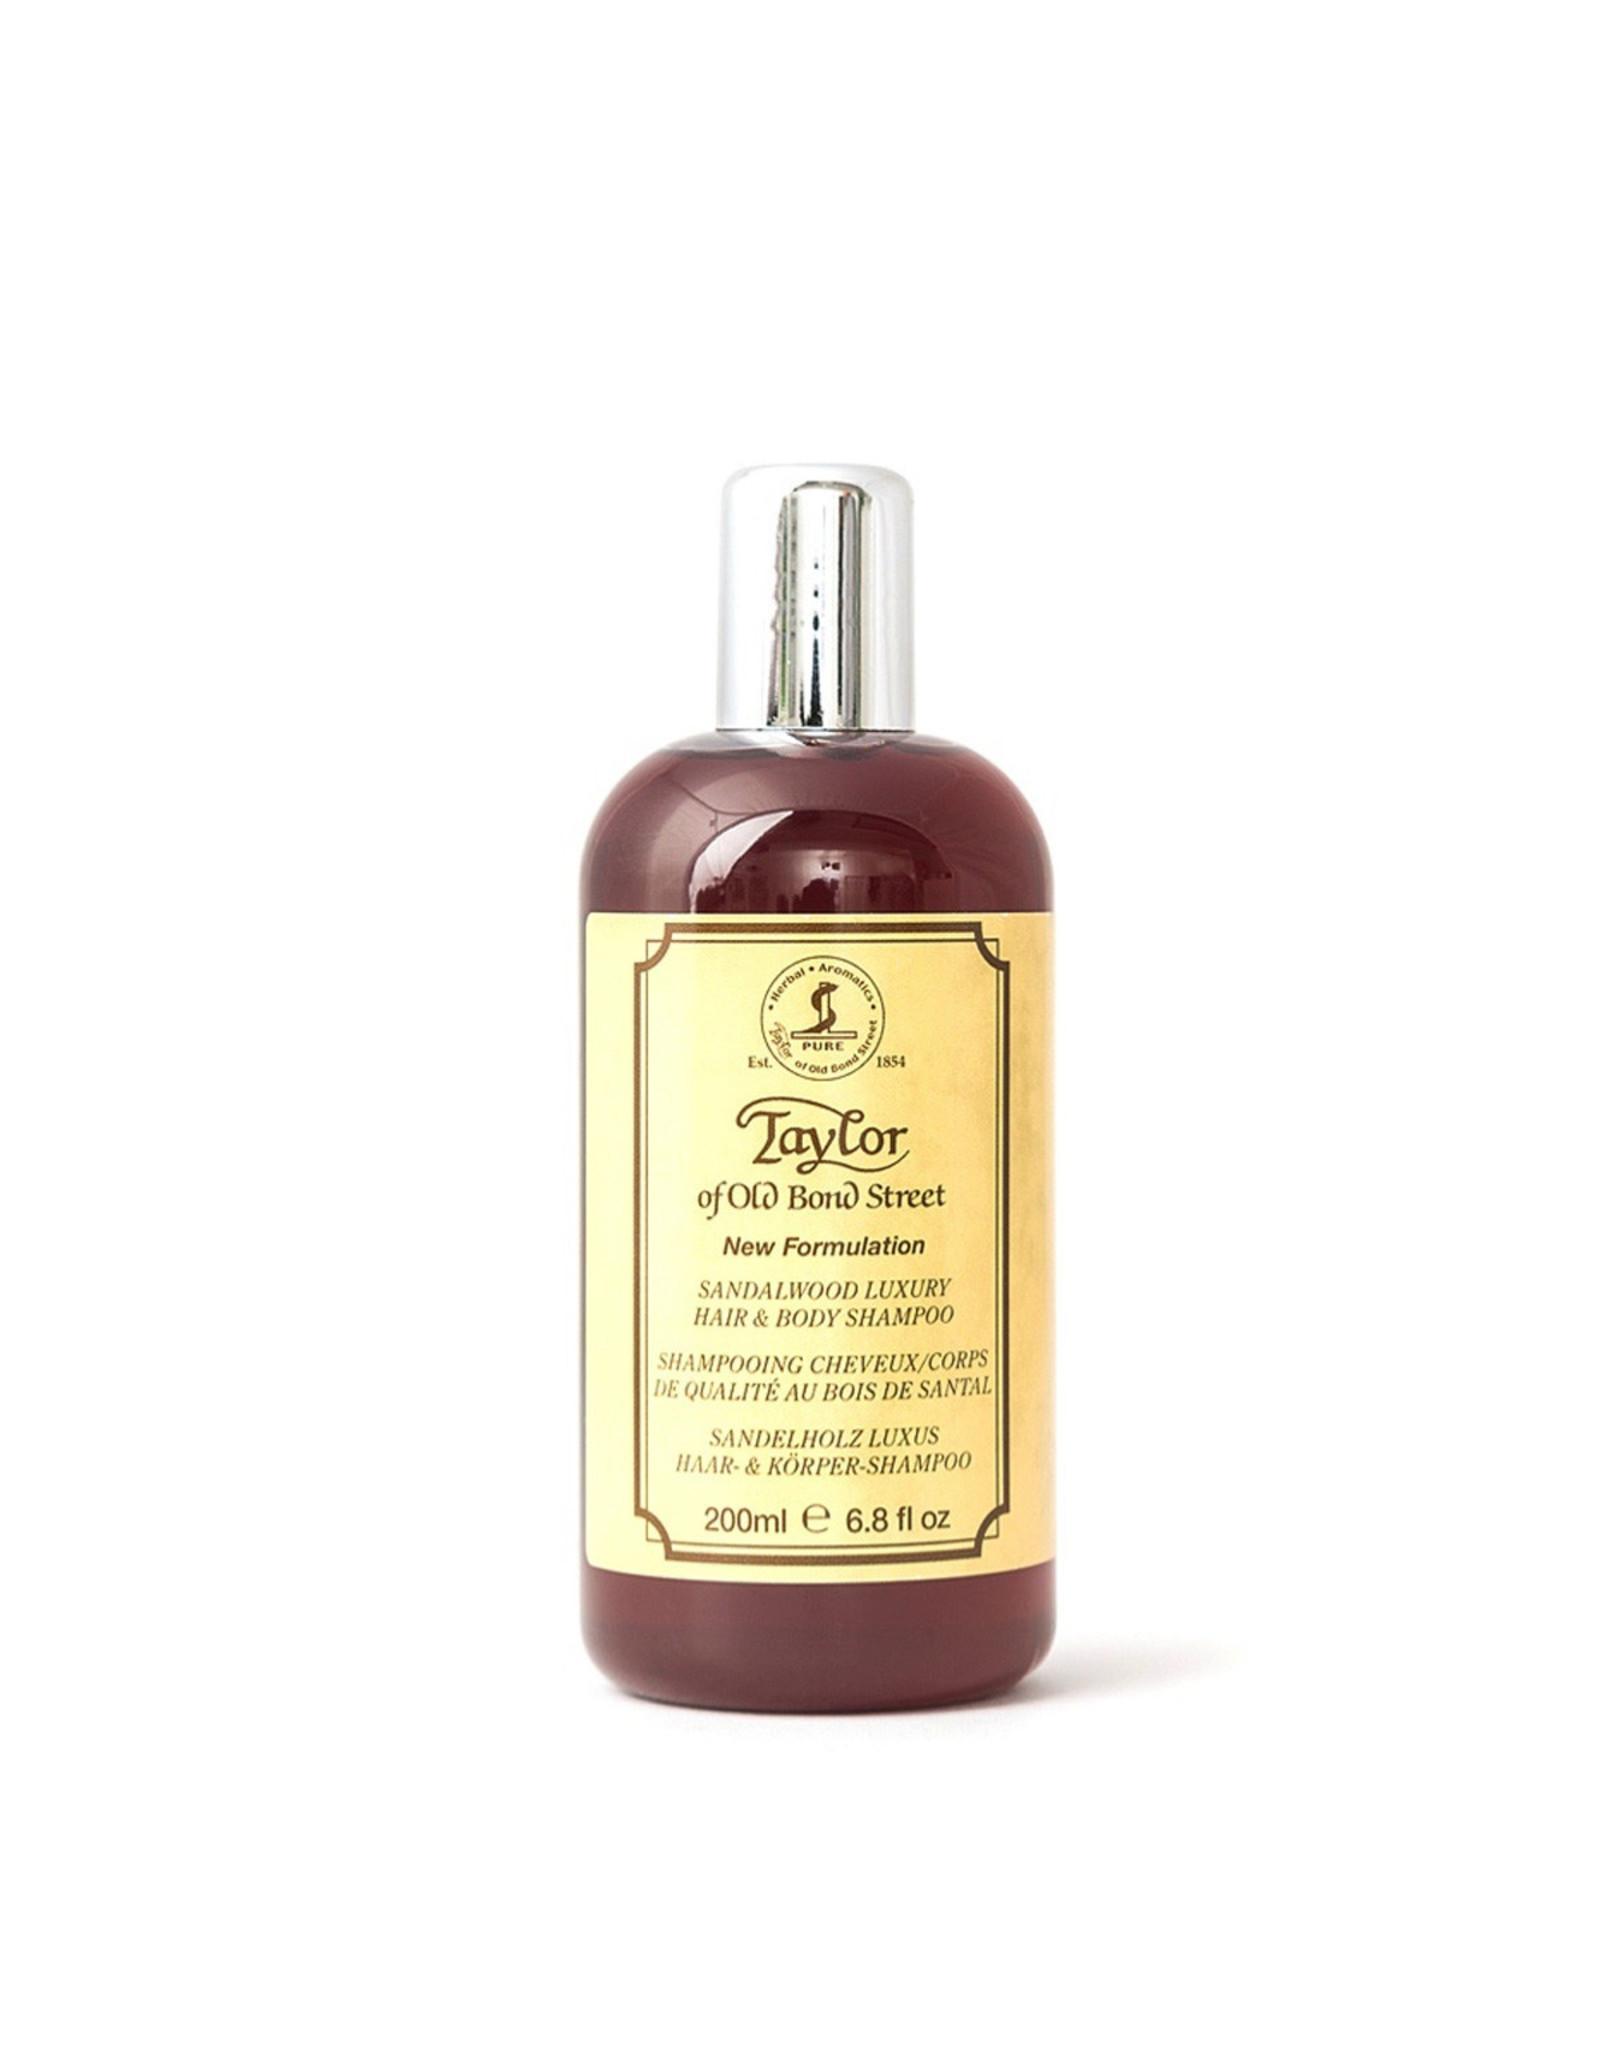 Taylor of Old Bond Street Hair & Body Shampoo 200ml Sandalwood